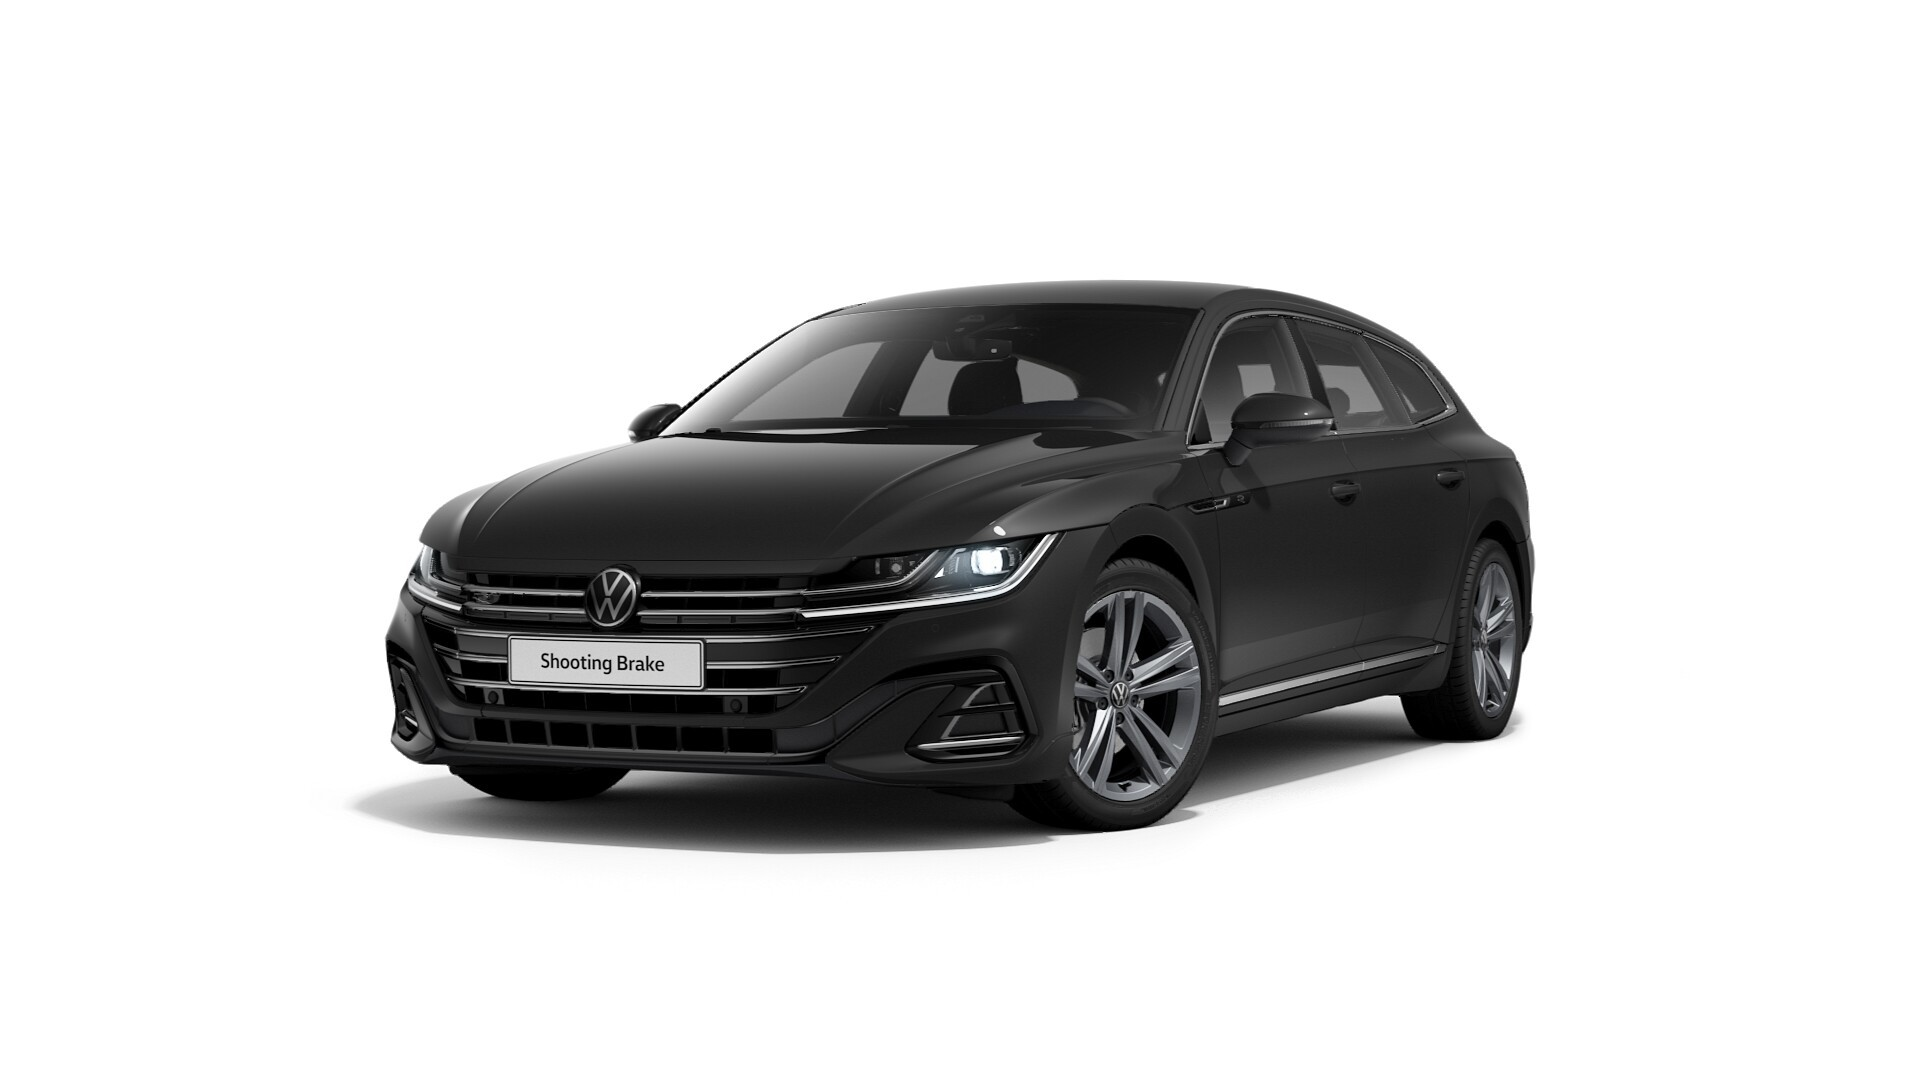 Arteon SB R-Line 2.0 TDI SCR DSG / 200 CP/147 kW / 2.0l / Direct Shift Gearbox / 4-usi : Volkswagen Arteon SB R-Line